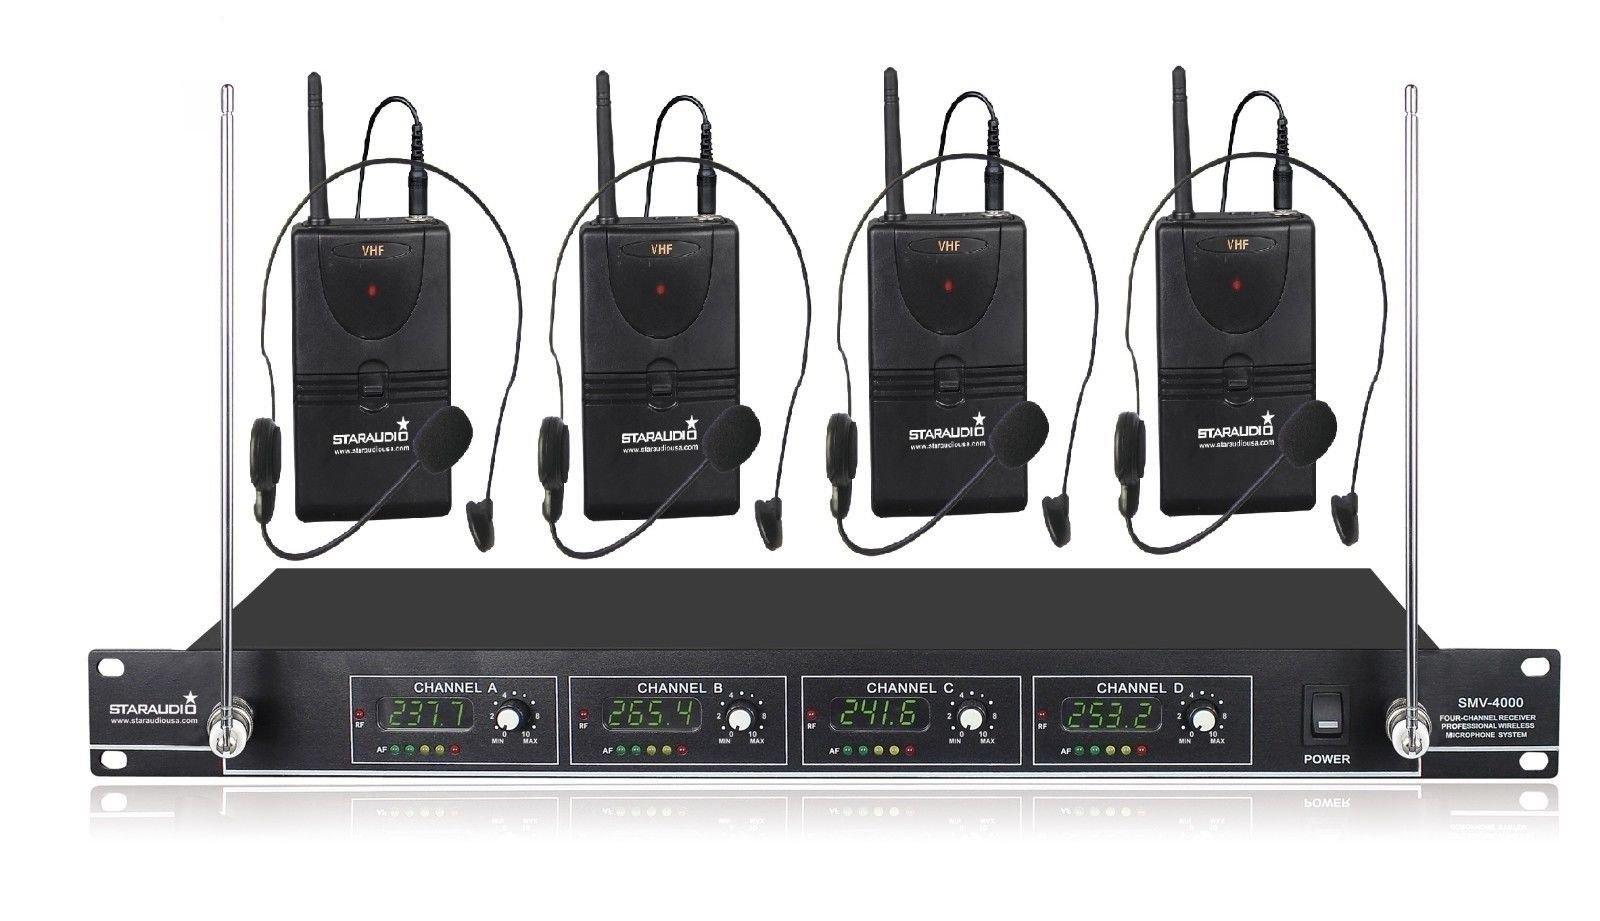 STARAUDIO SMV-4000B Pro 4 Channel PA DJ Stage Church Karaoke KTV Wireless Headset Lavalier Microphone System by STARAUDIO